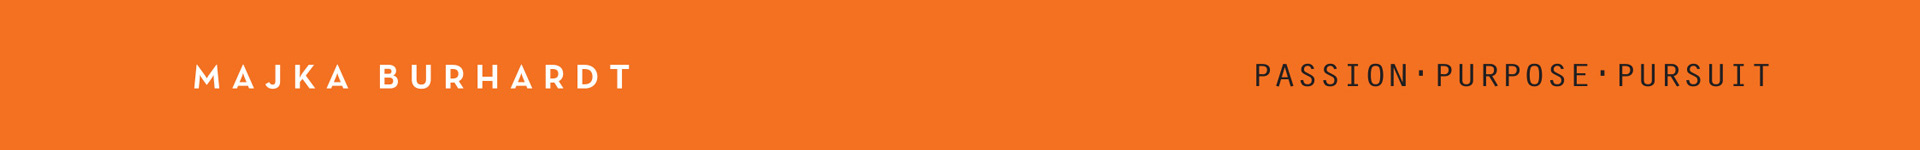 Majka-Burhardt-banner-3P-1920x150